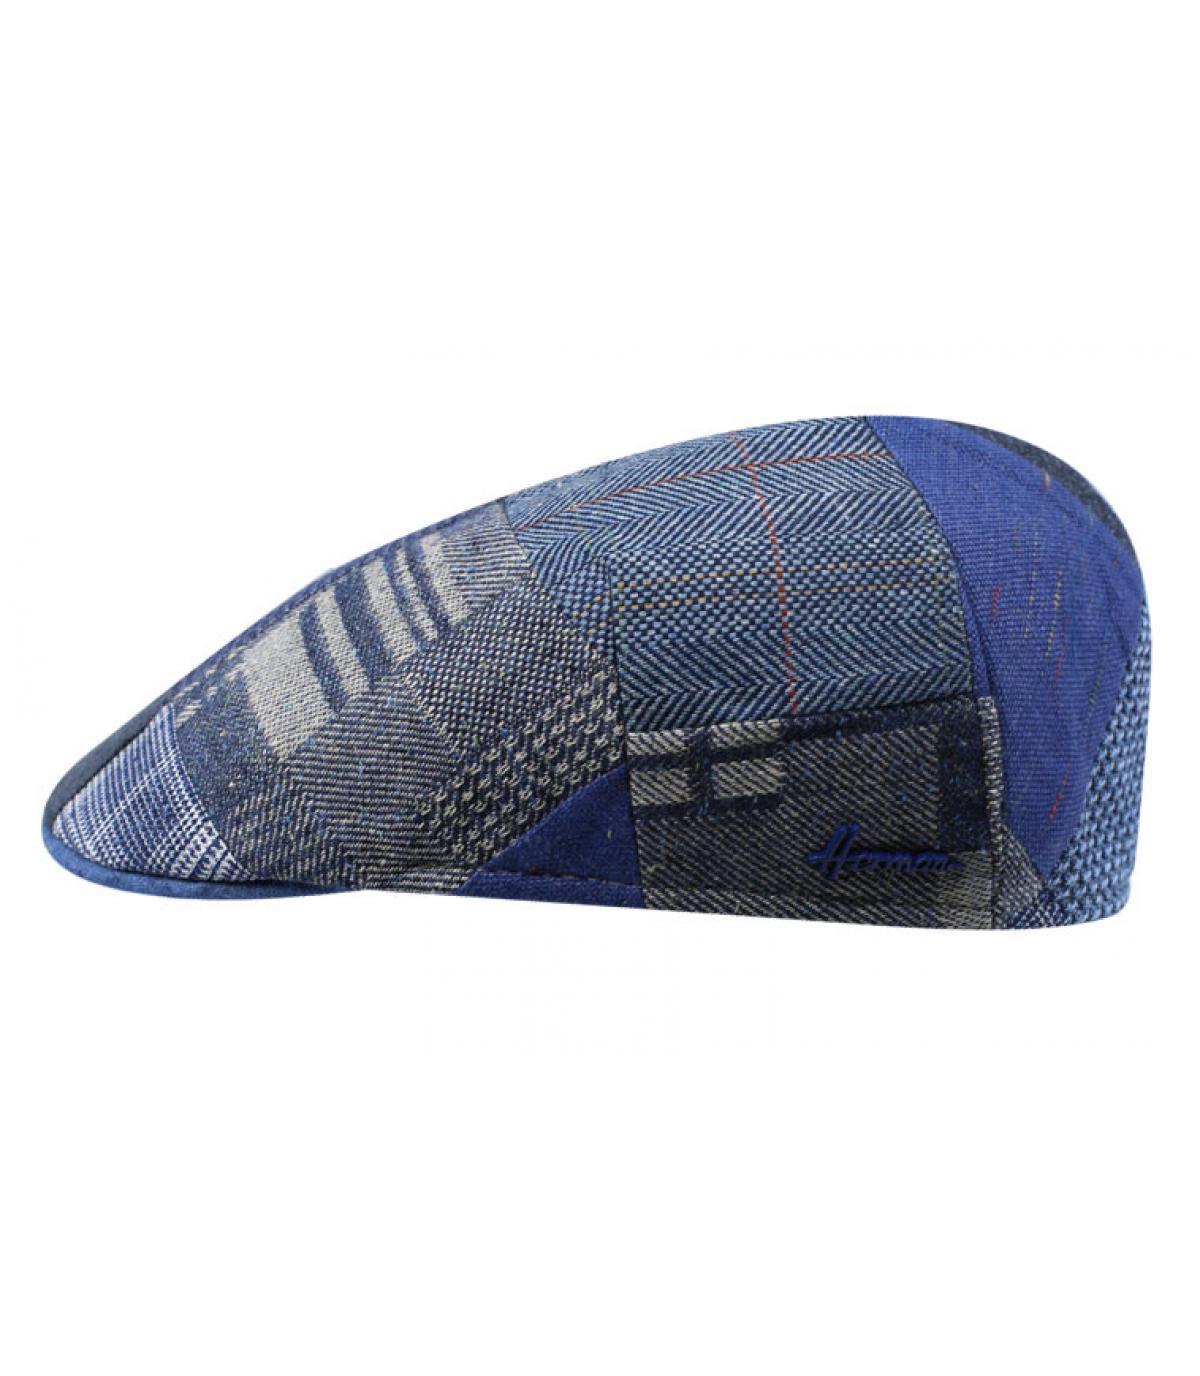 Details Boxer Patch blue - afbeeling 2